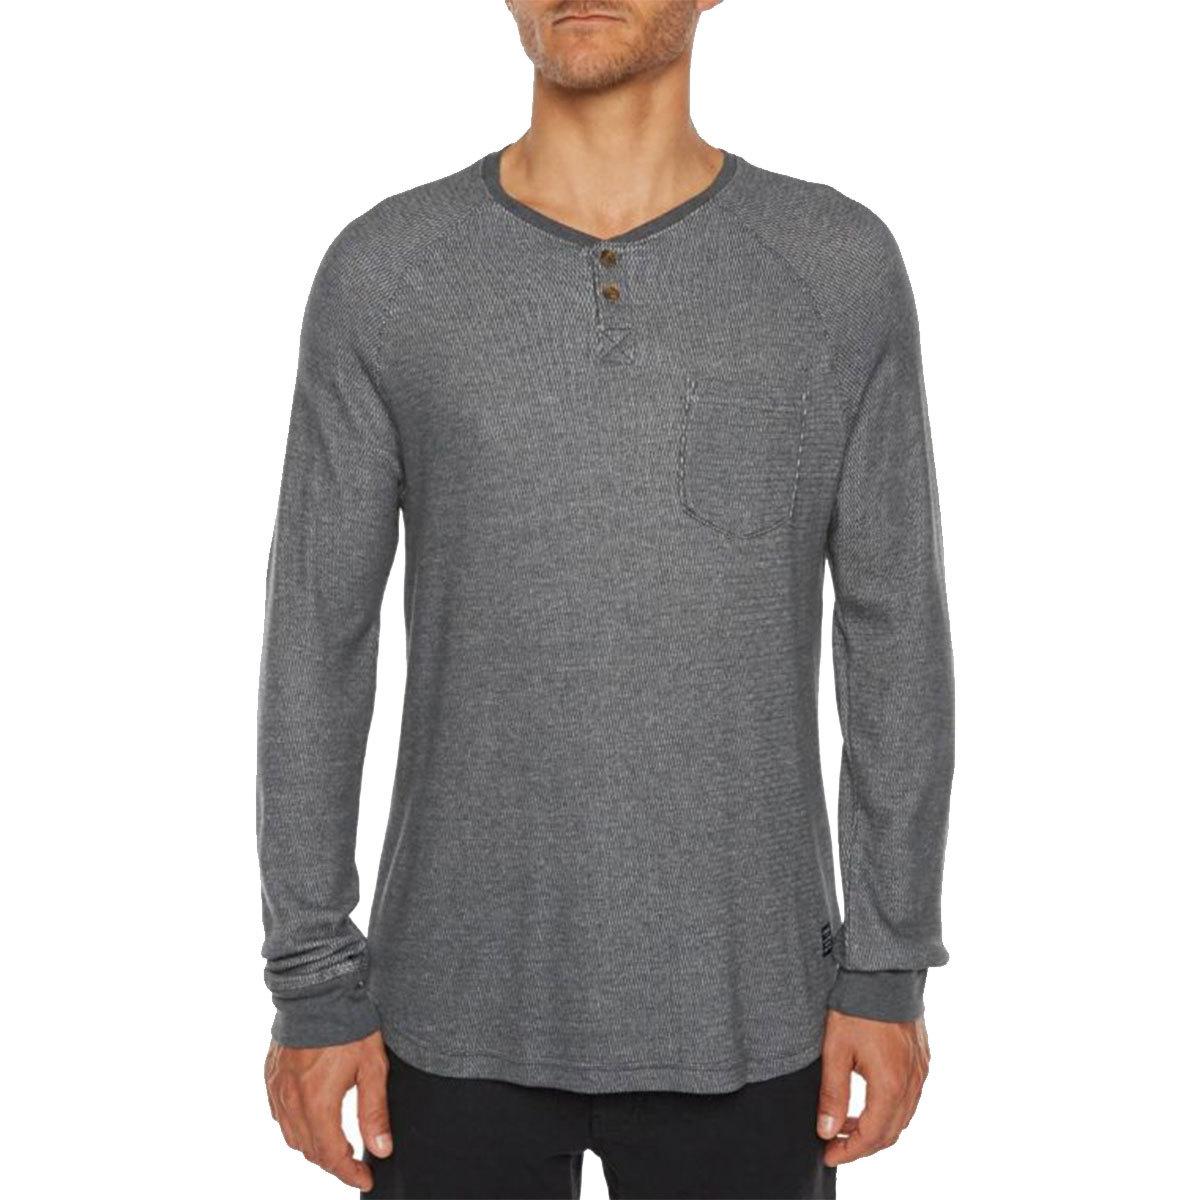 O'neill Guys' Nelson Knit Long-Sleeve Henley - Black, XL